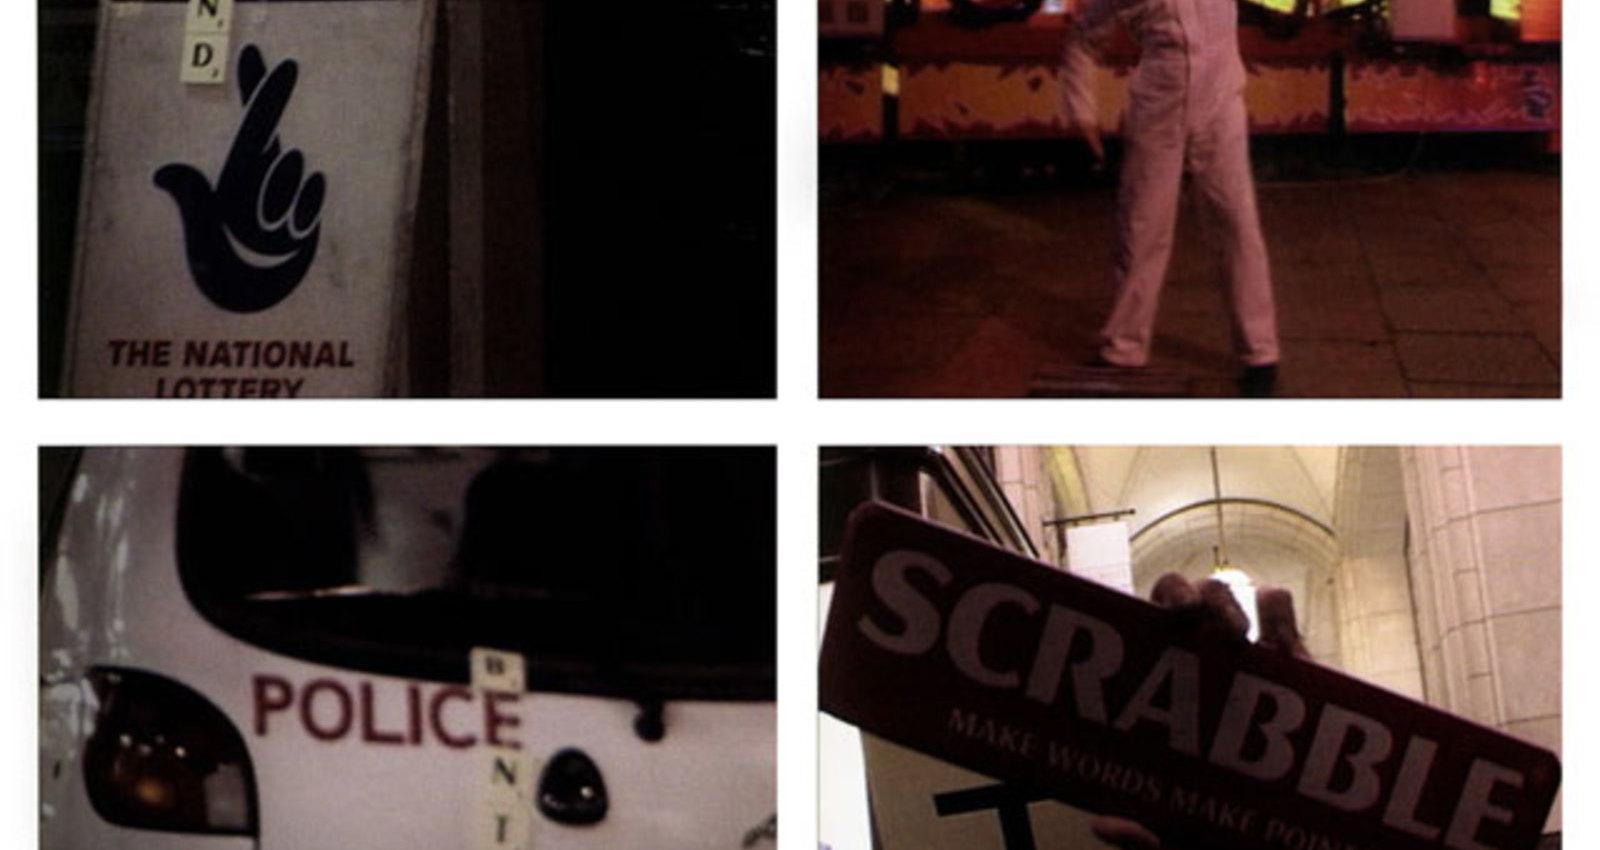 The Scrabbler